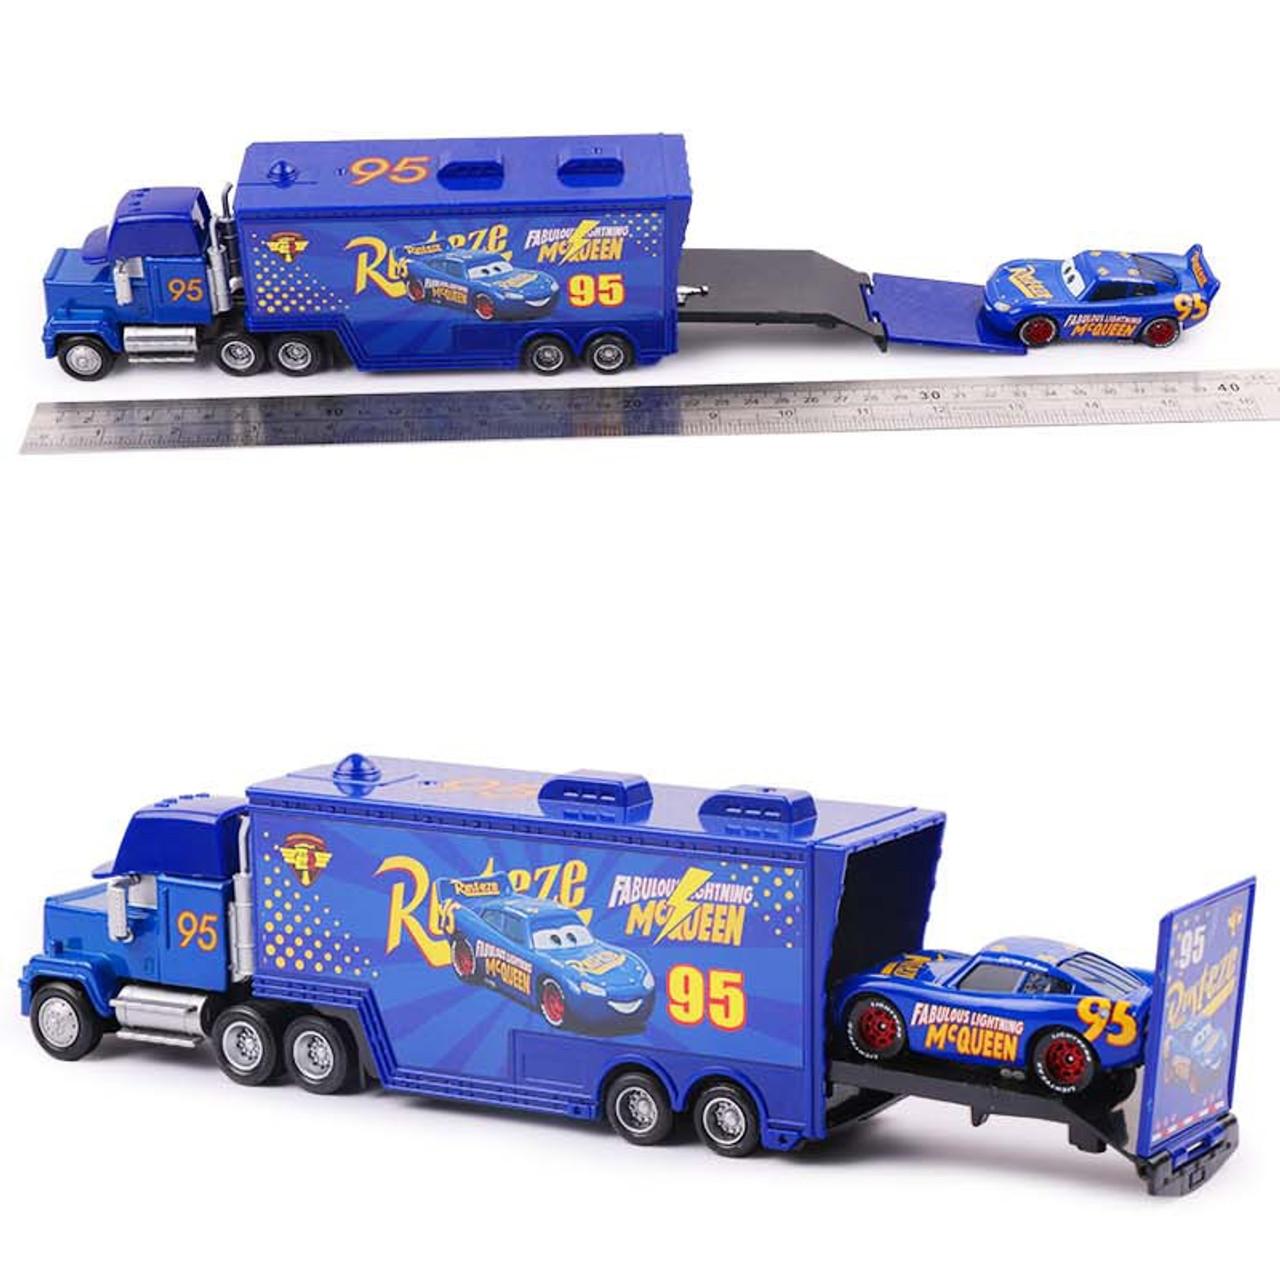 Disney Pixar Cars 2 3 Toys Lightning Mcqueen Jackson Storm Mack Uncle Truck 1 55 Diecast Model Car Toy Children Birthday Gift Onshopdeals Com